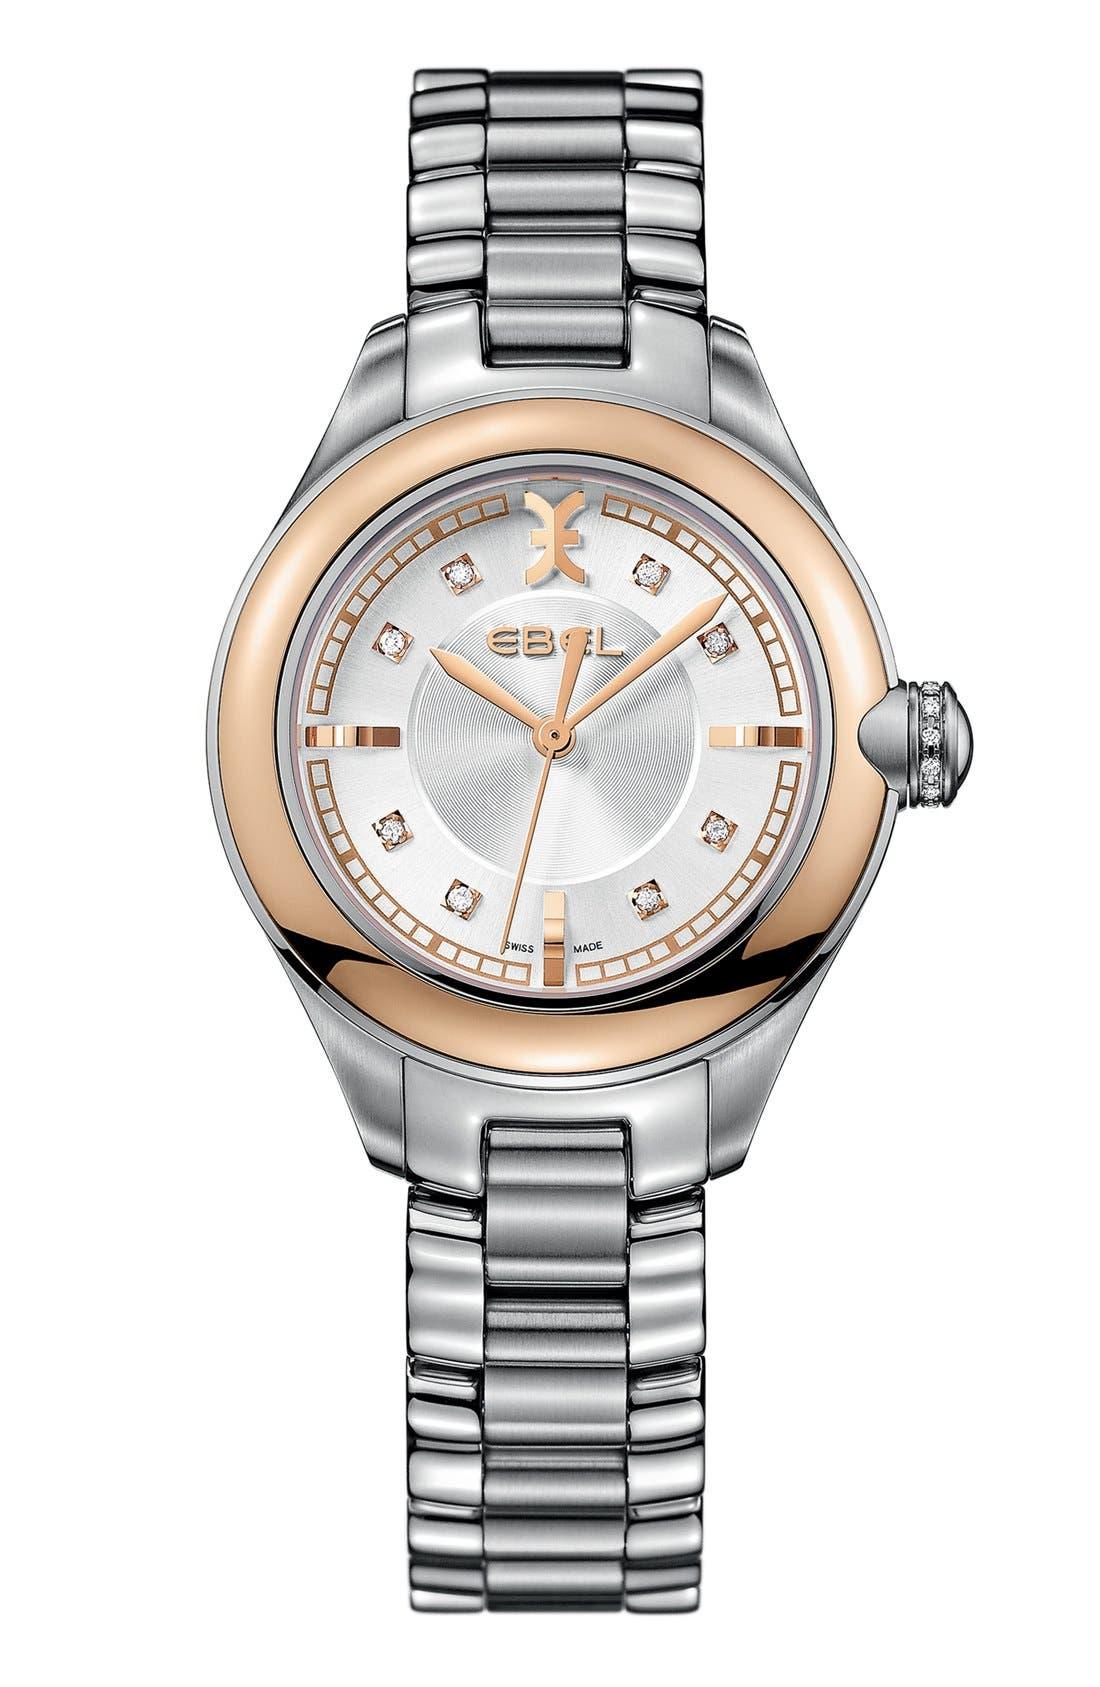 Main Image - EBEL 'Onde' Diamond Index Bracelet Watch, 30mm